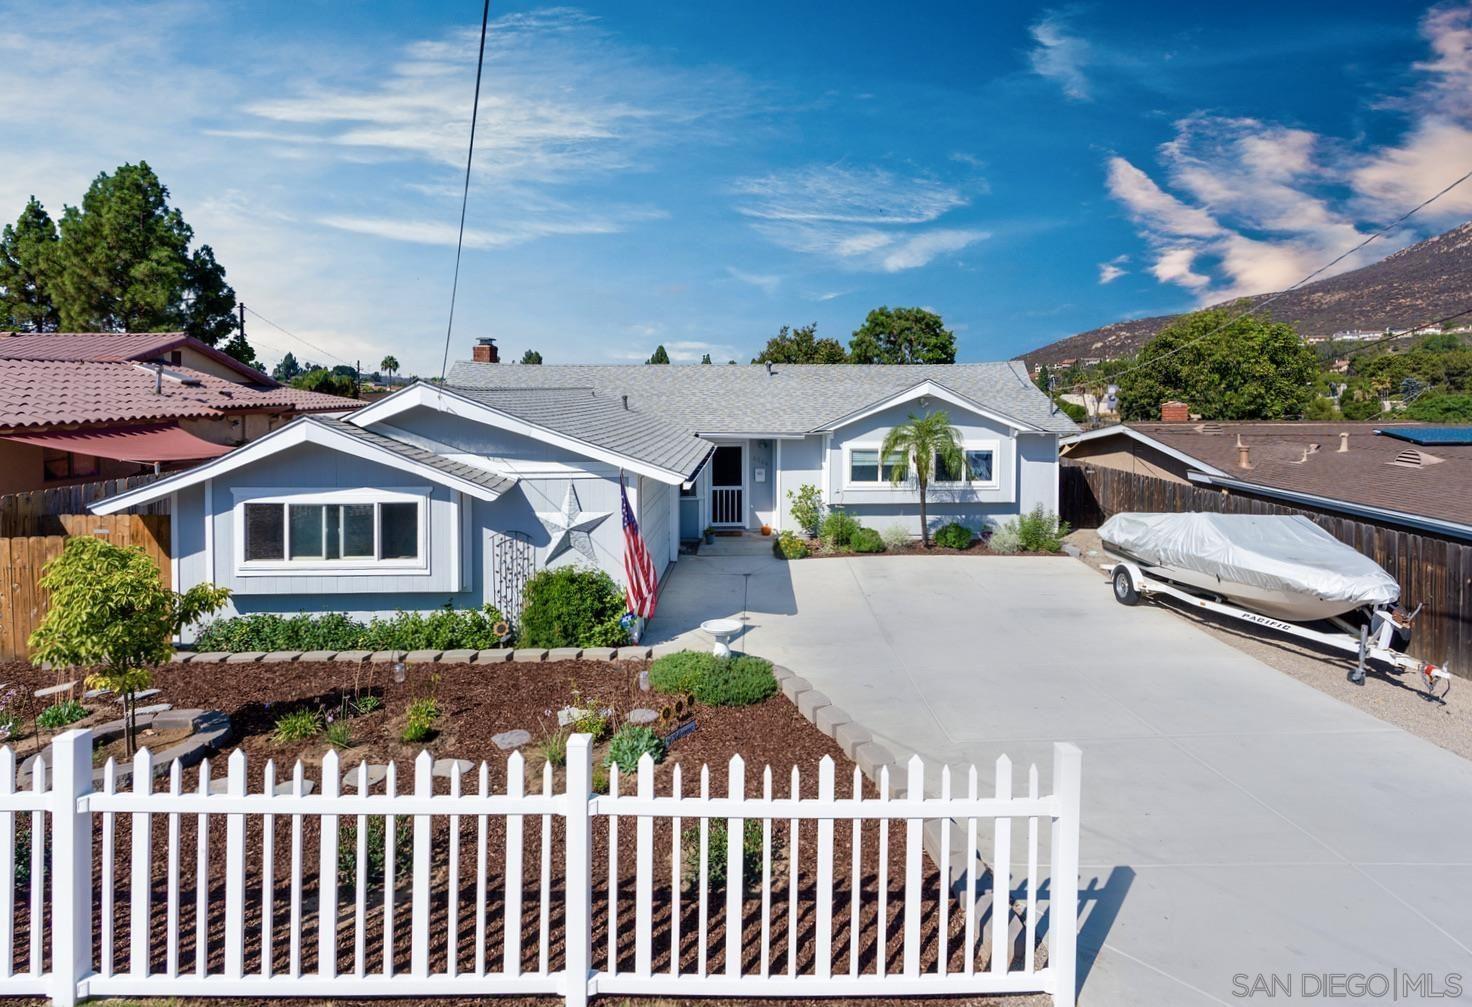 Photo for 6564 Bantam Lake Ave, San Diego, CA 92119 (MLS # 210026181)